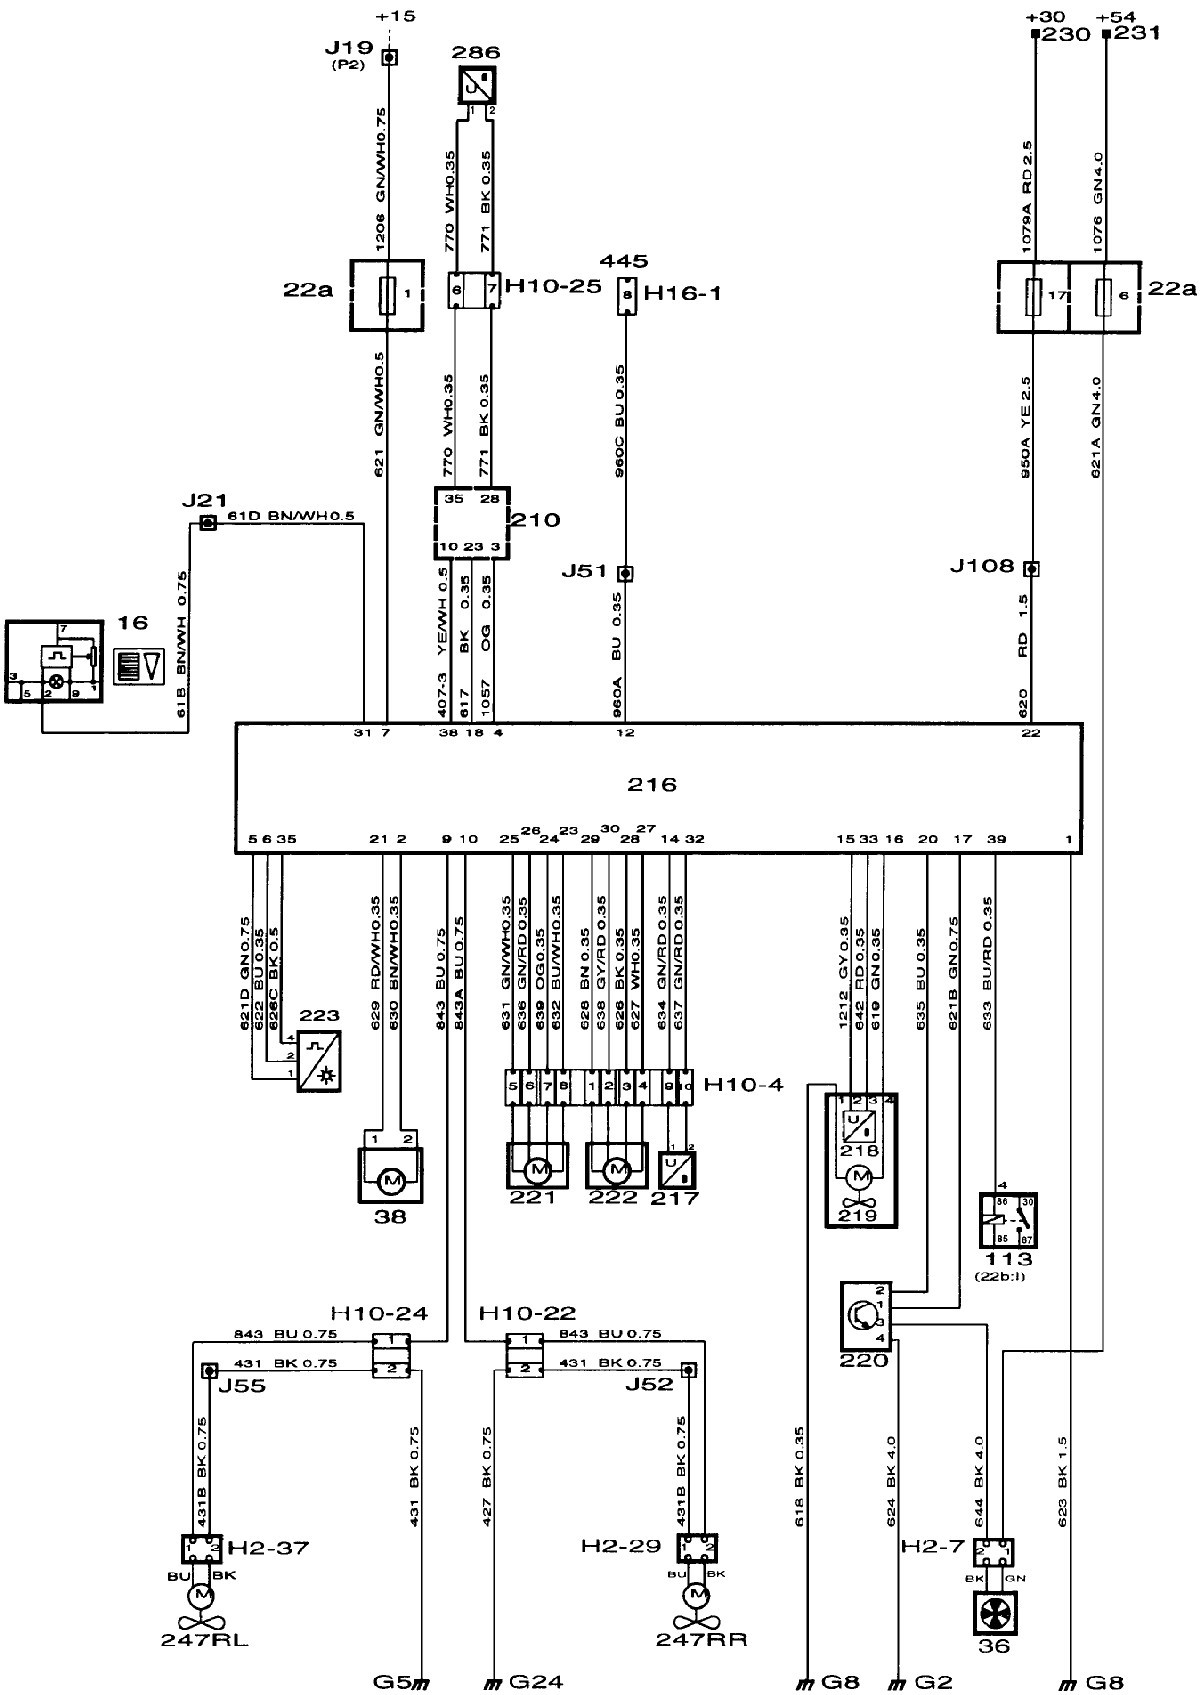 saab 93 stereo wiring harness wiring circuit u2022 rh wiringonline today 2005 Saab 9 3 Problems 2005 Saab 9 3 Problems